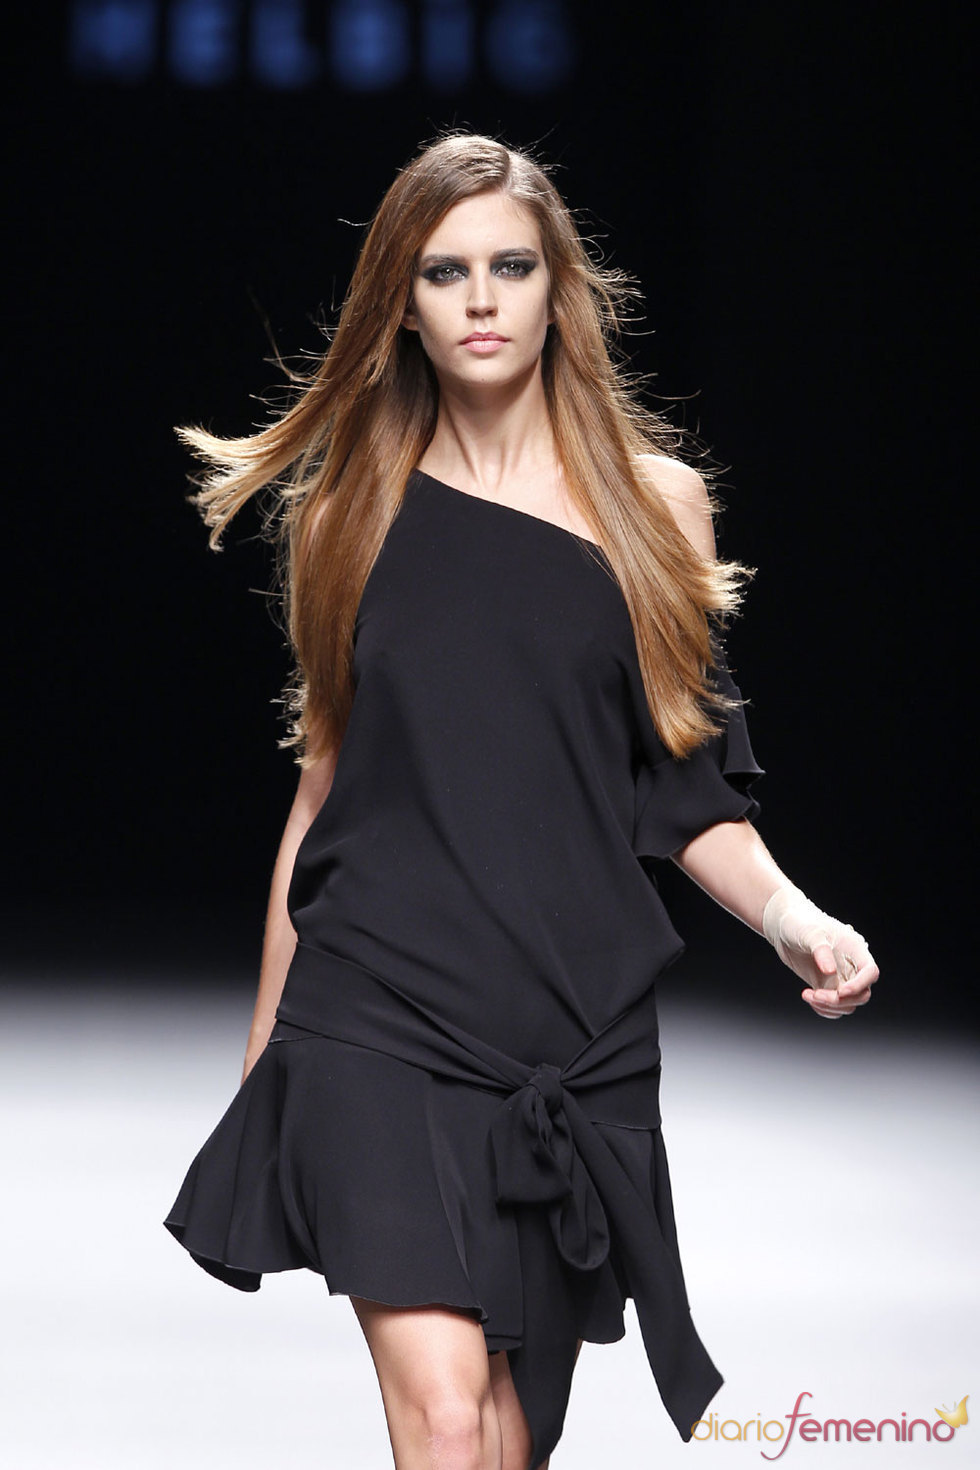 Moda Otoño Invierno - Vestido corto negro de Teresa Helbig